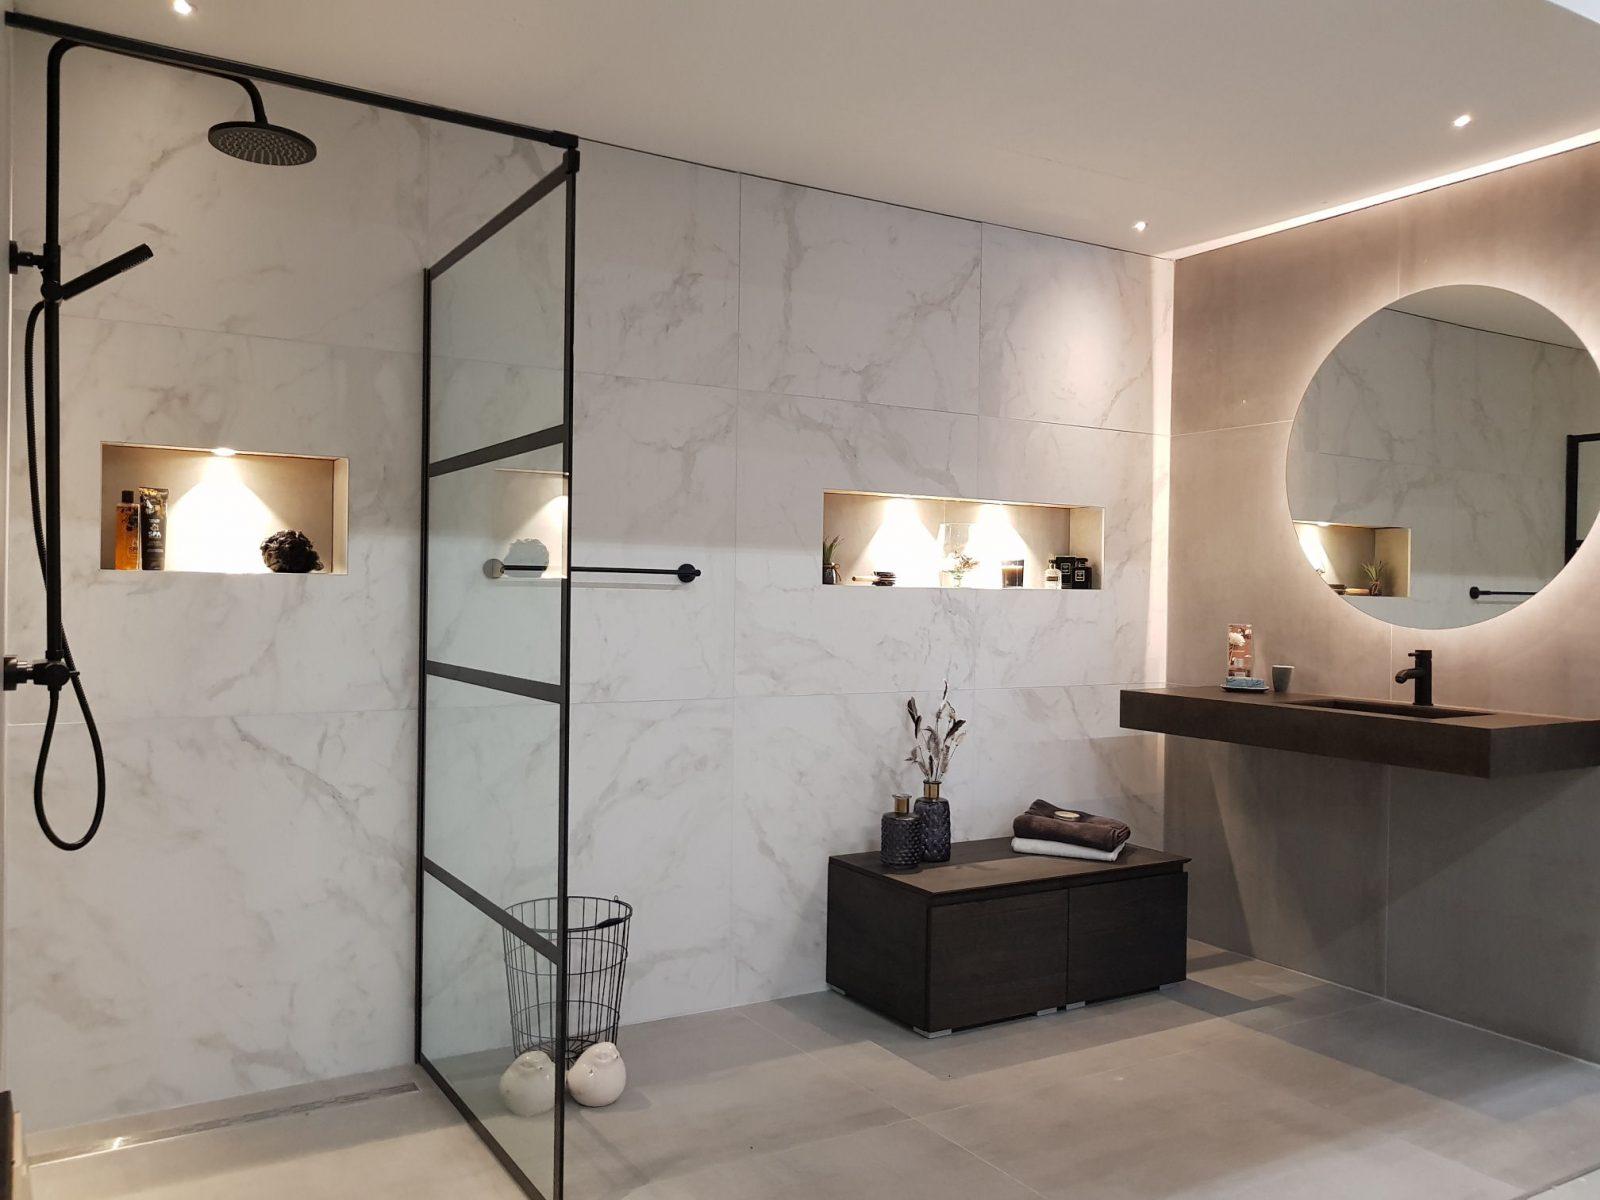 Design Badkamer Rotterdam : Badkamerhuis de sanitairwinkel en tegelwinkel van rotterdam